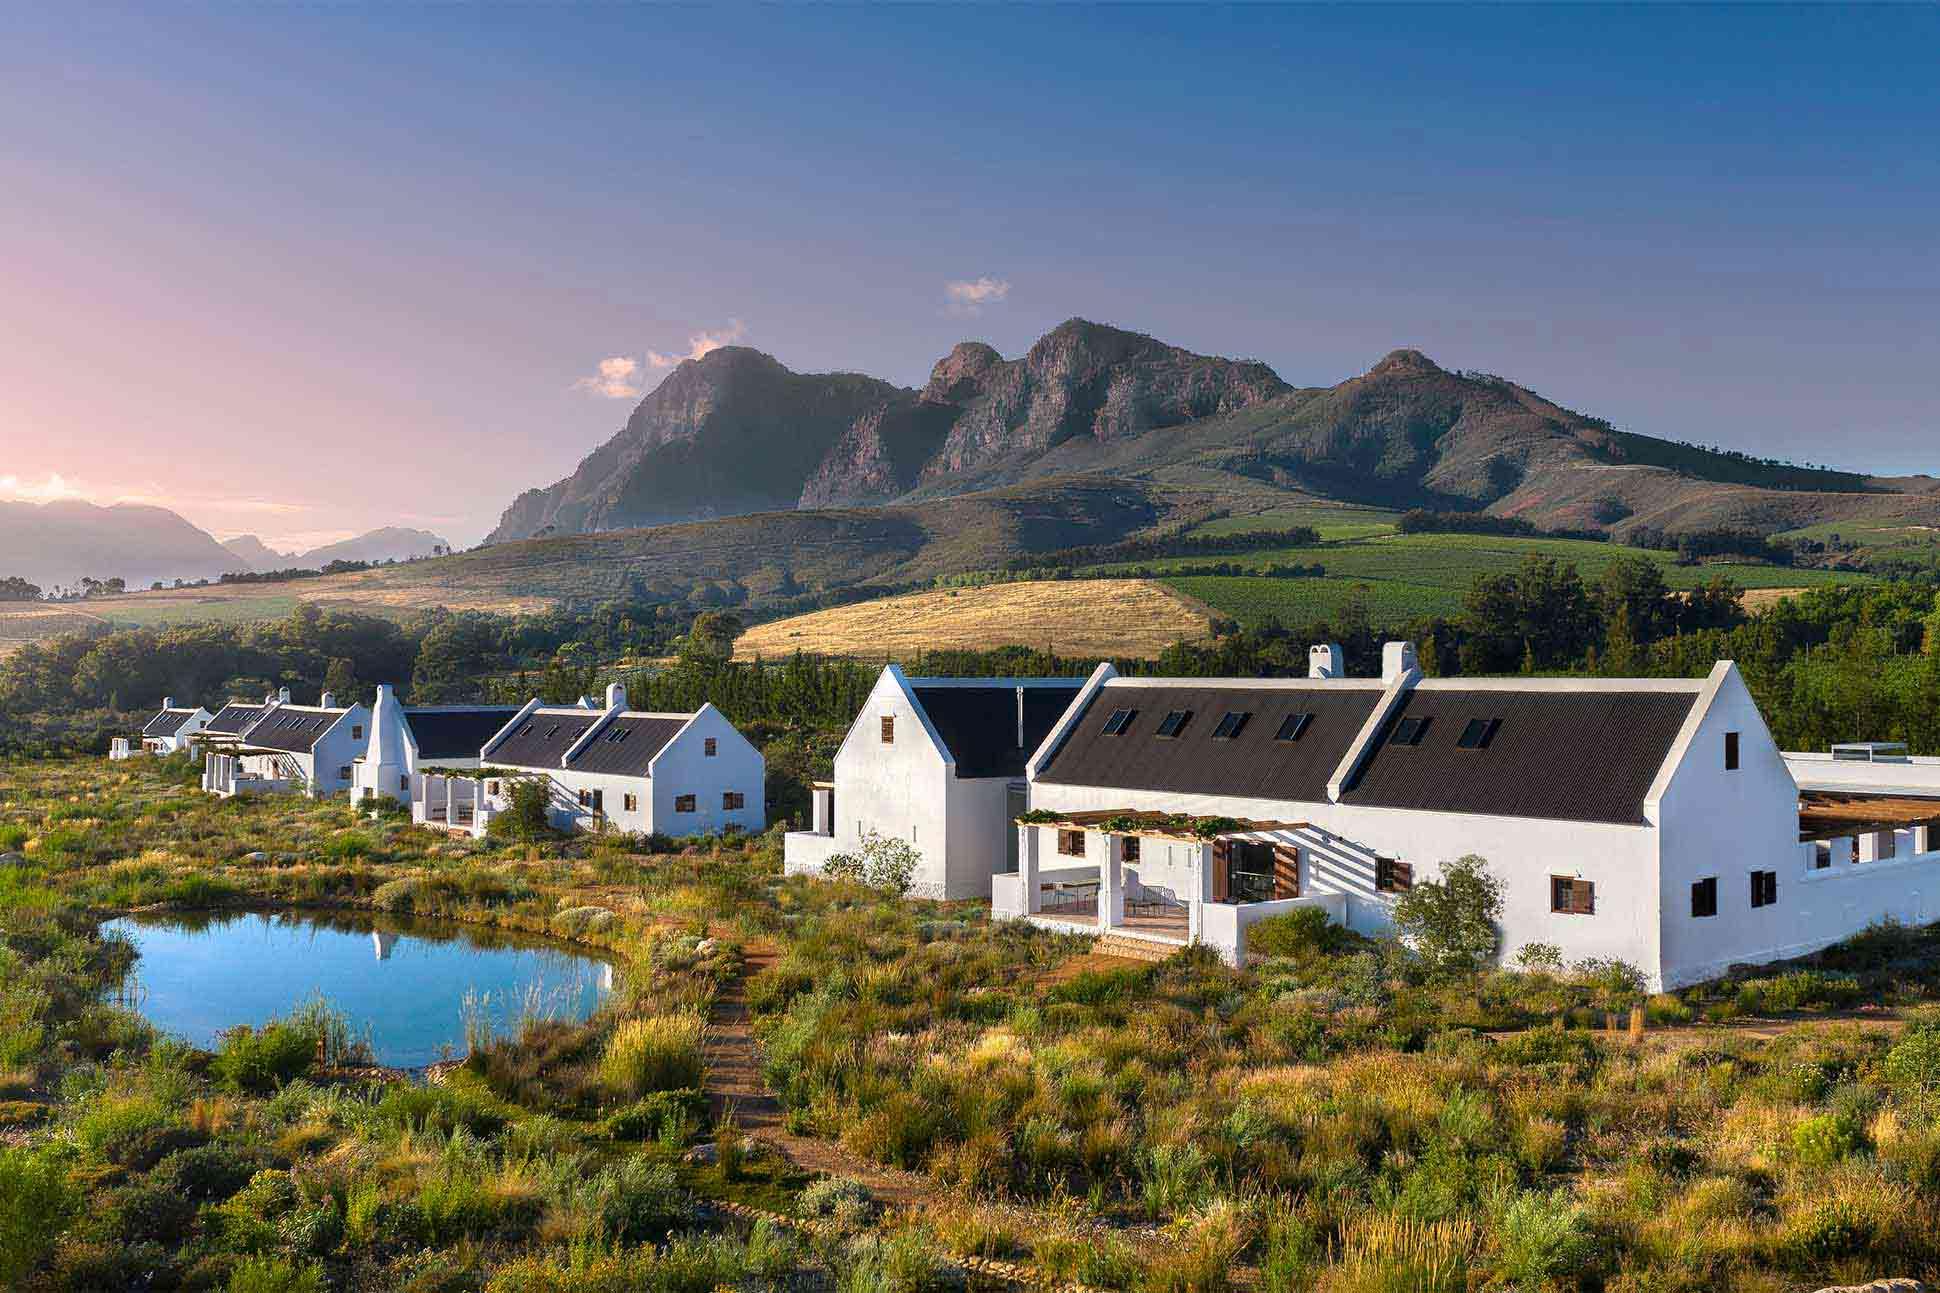 Exterior view of Fynbos Family House, Babylonstoren, South Africa